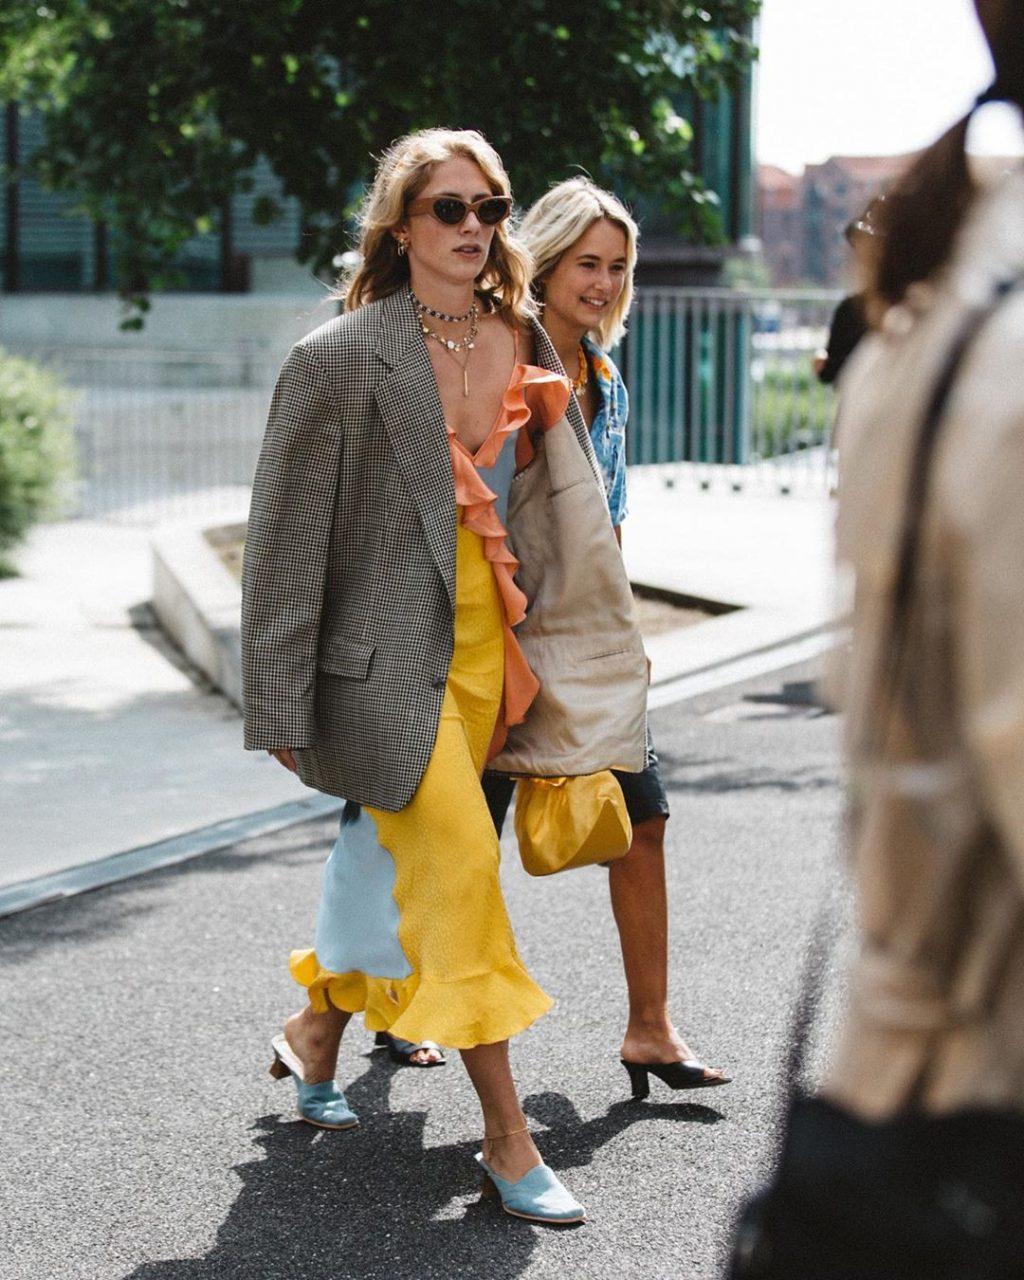 Fashionista mặc váy maxi cùng áo blazer kẻ